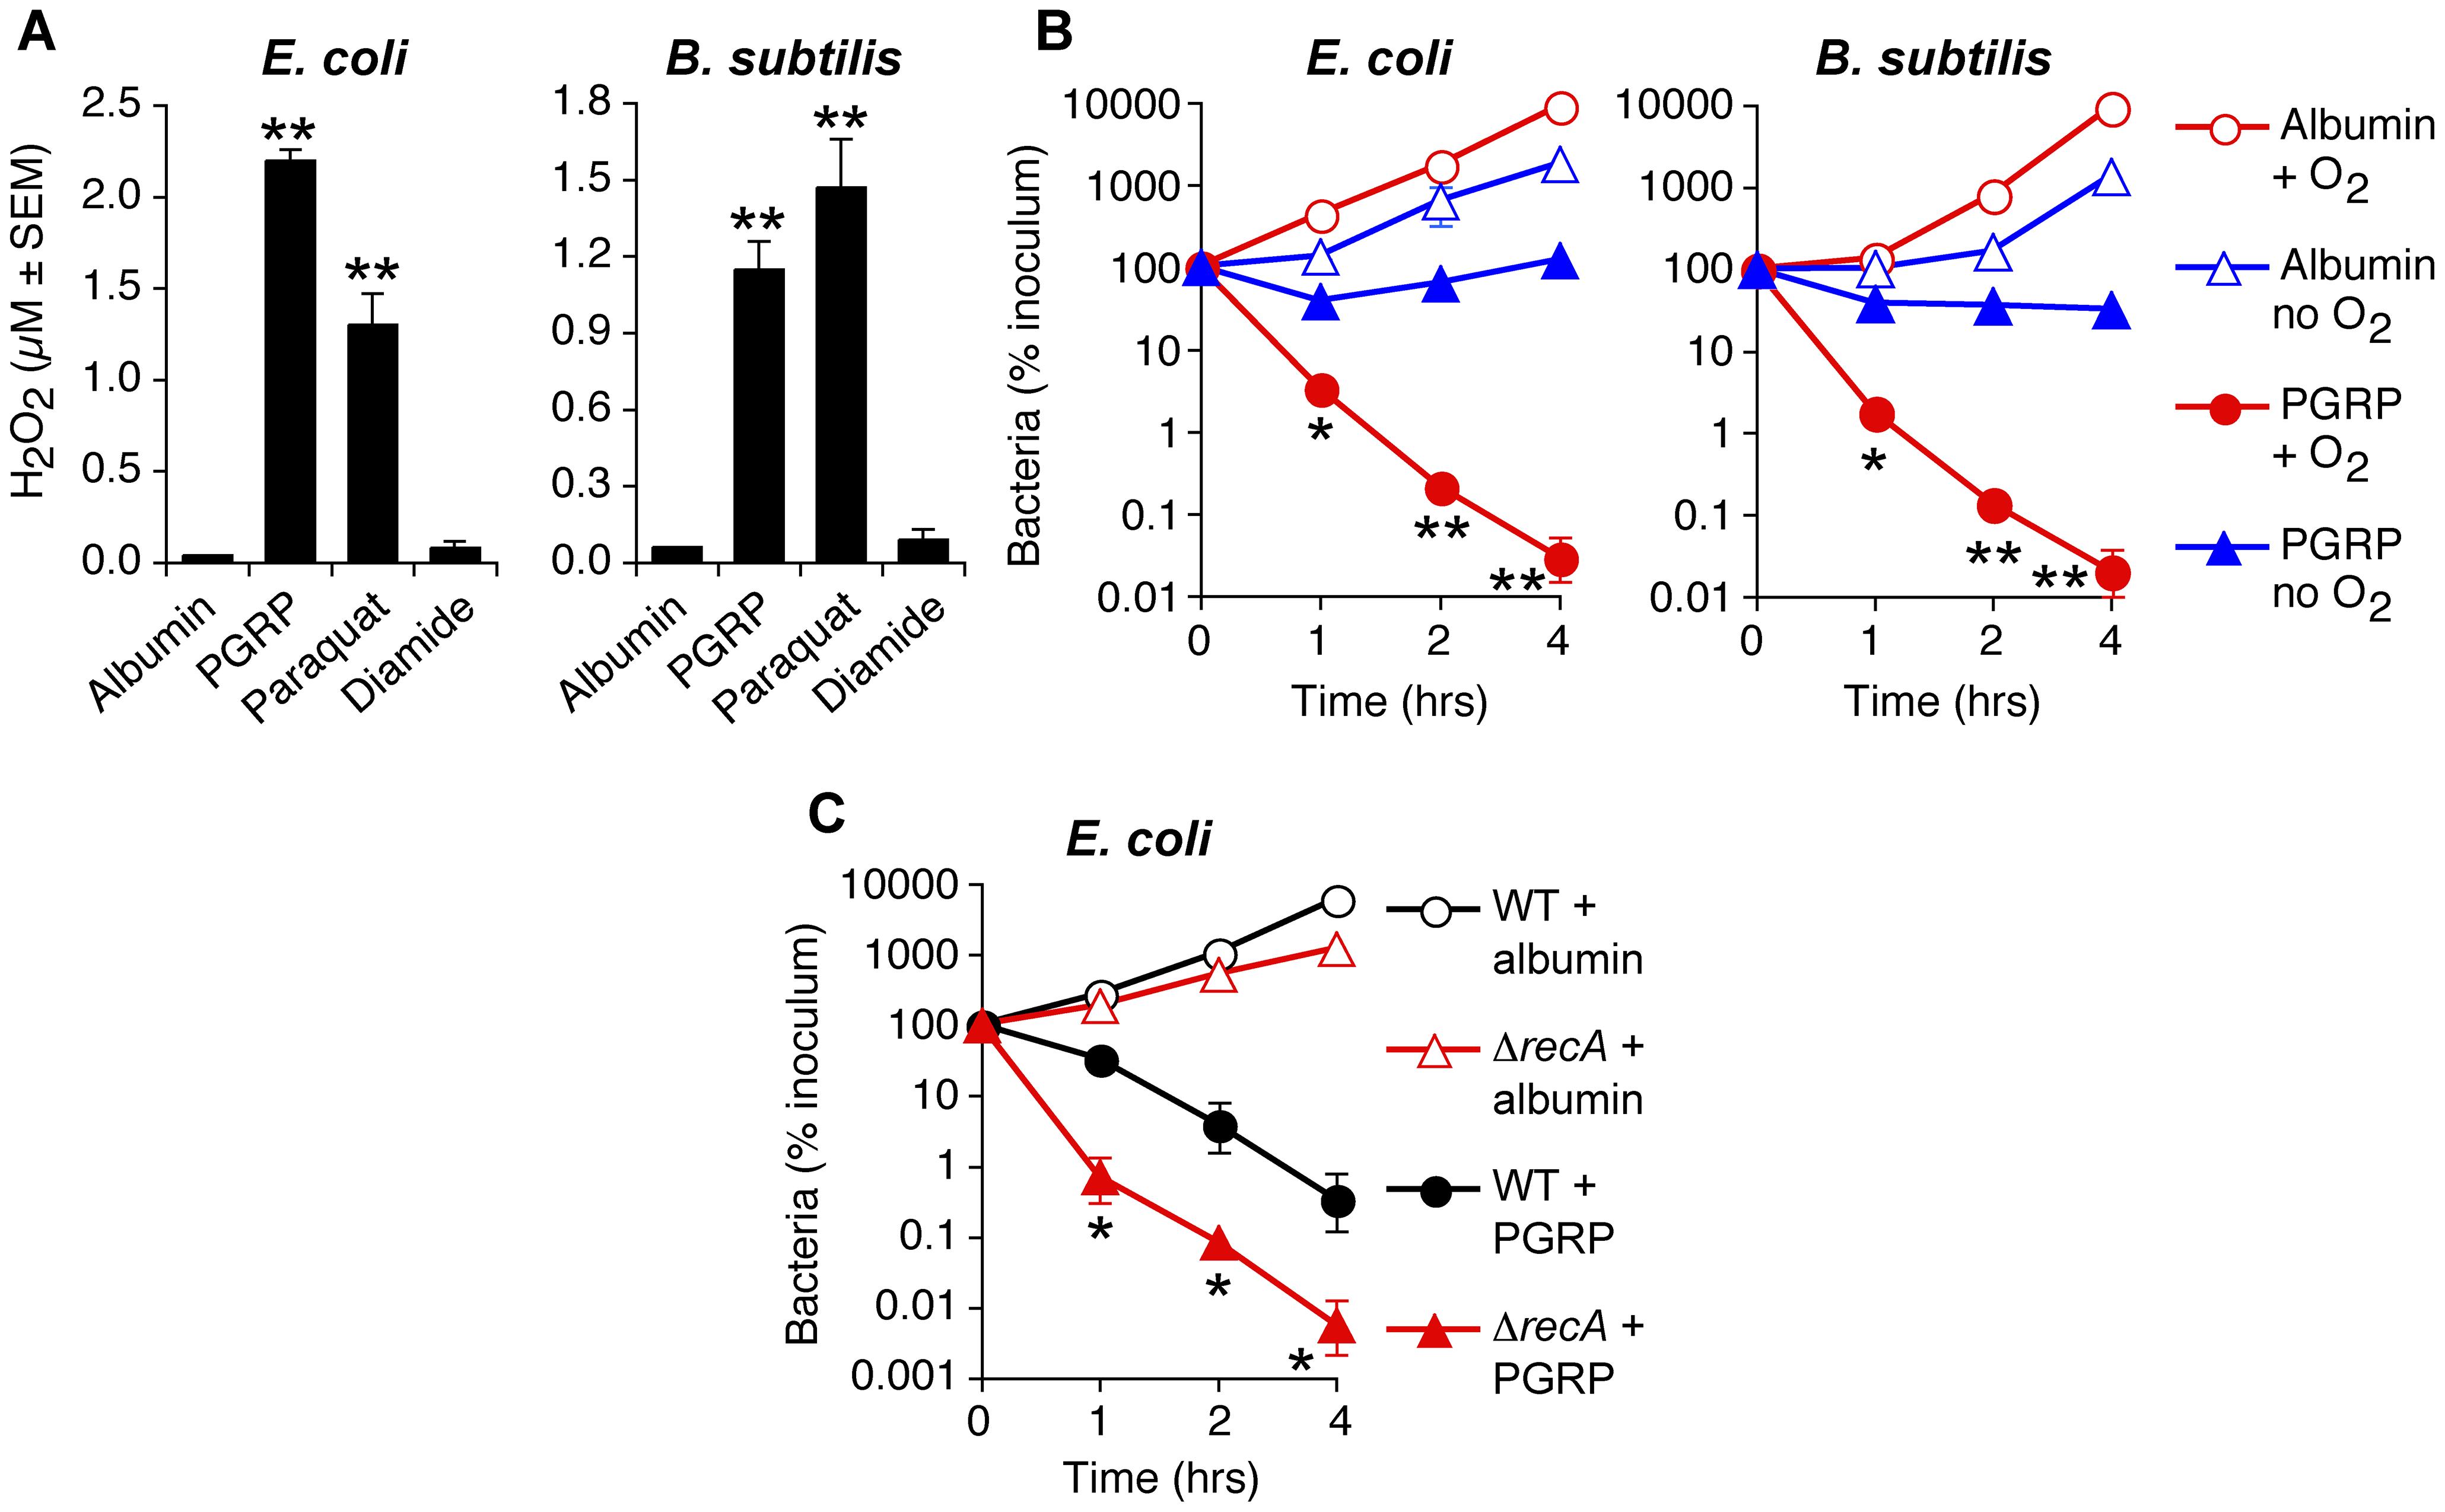 PGRP induces H<sub>2</sub>O<sub>2</sub> production, requires O<sub>2</sub> for killing, and the killing involves DNA damage.